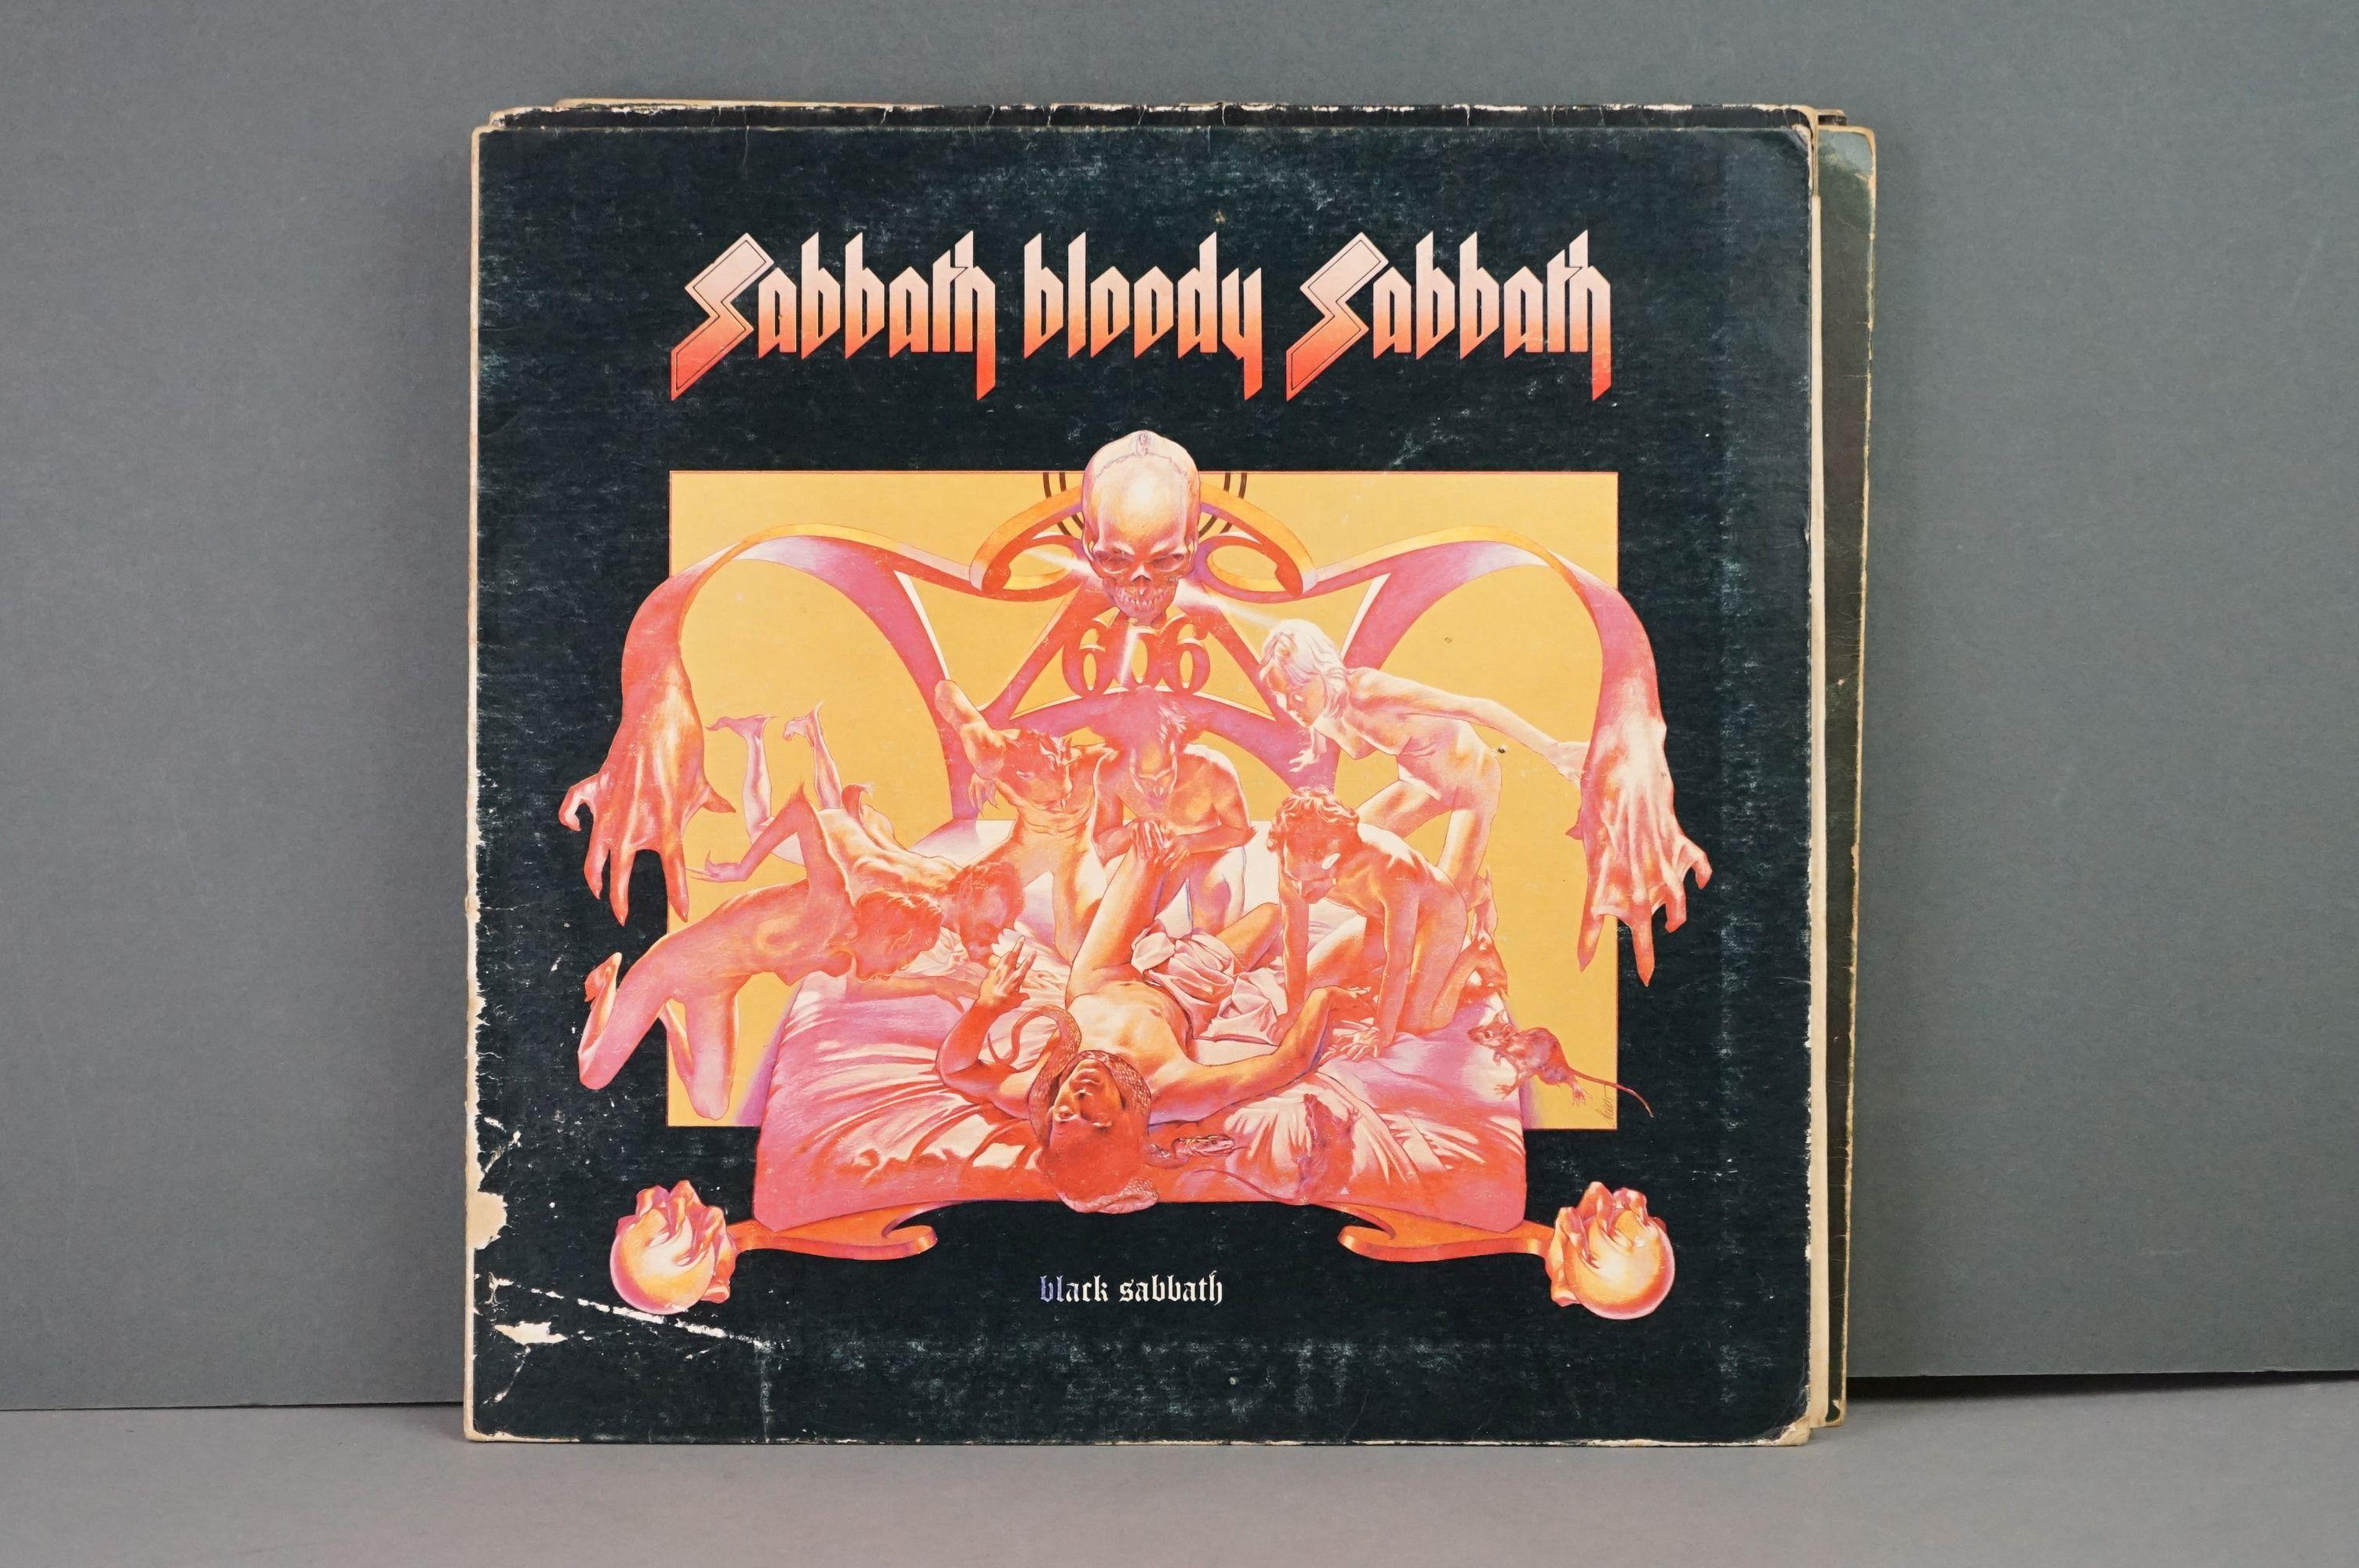 Vinyl - Twelve Black Sabbath vinyl LP's to include Technical Ecstasy (Vertigo Records PRICE 40), - Image 10 of 17